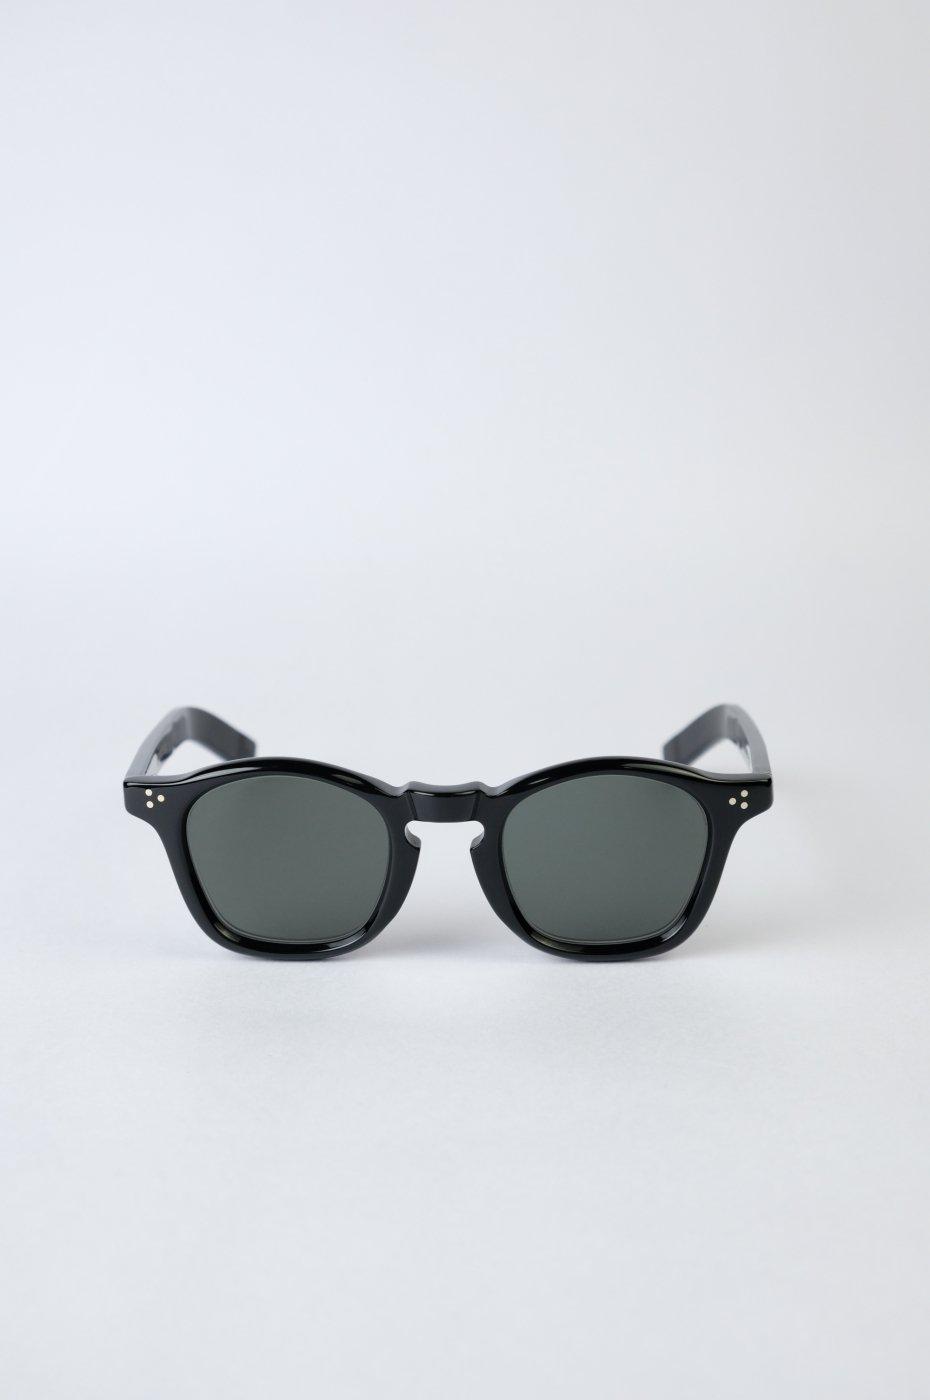 guépard ギュパール-gp-05- Noir-G15 Lens-